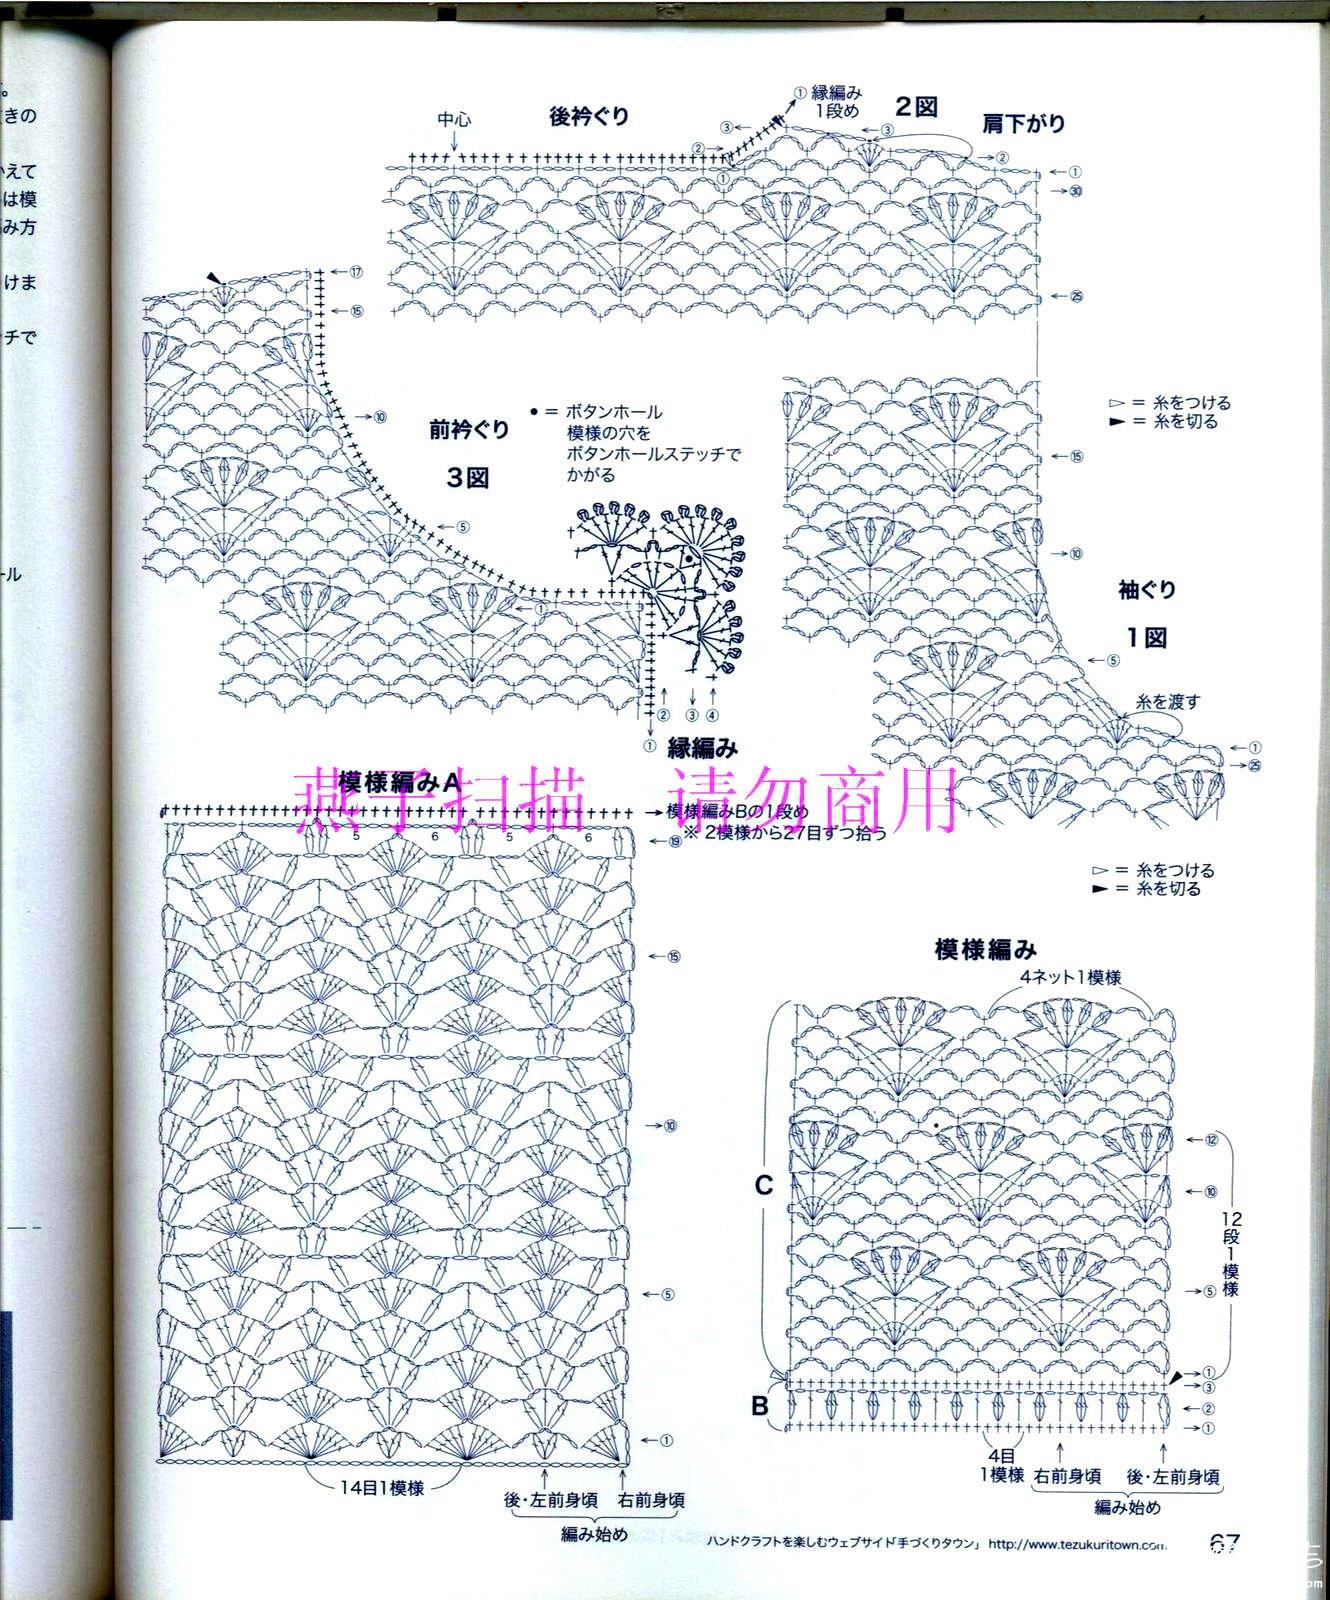 scan_58-1.JPG